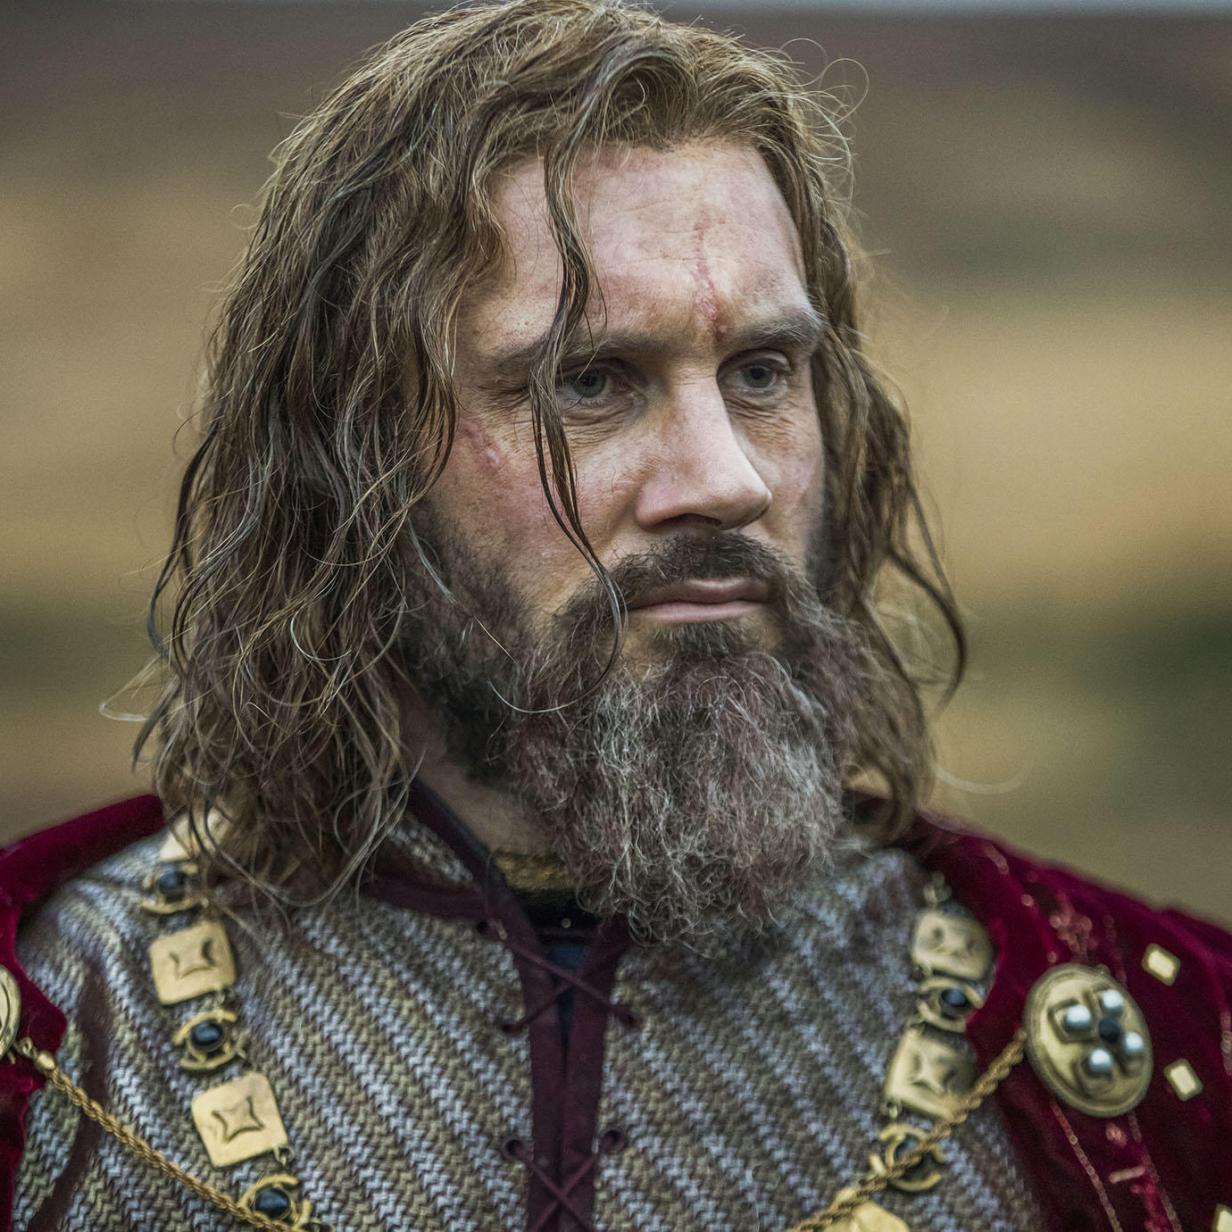 Bilderesultater for viking priests